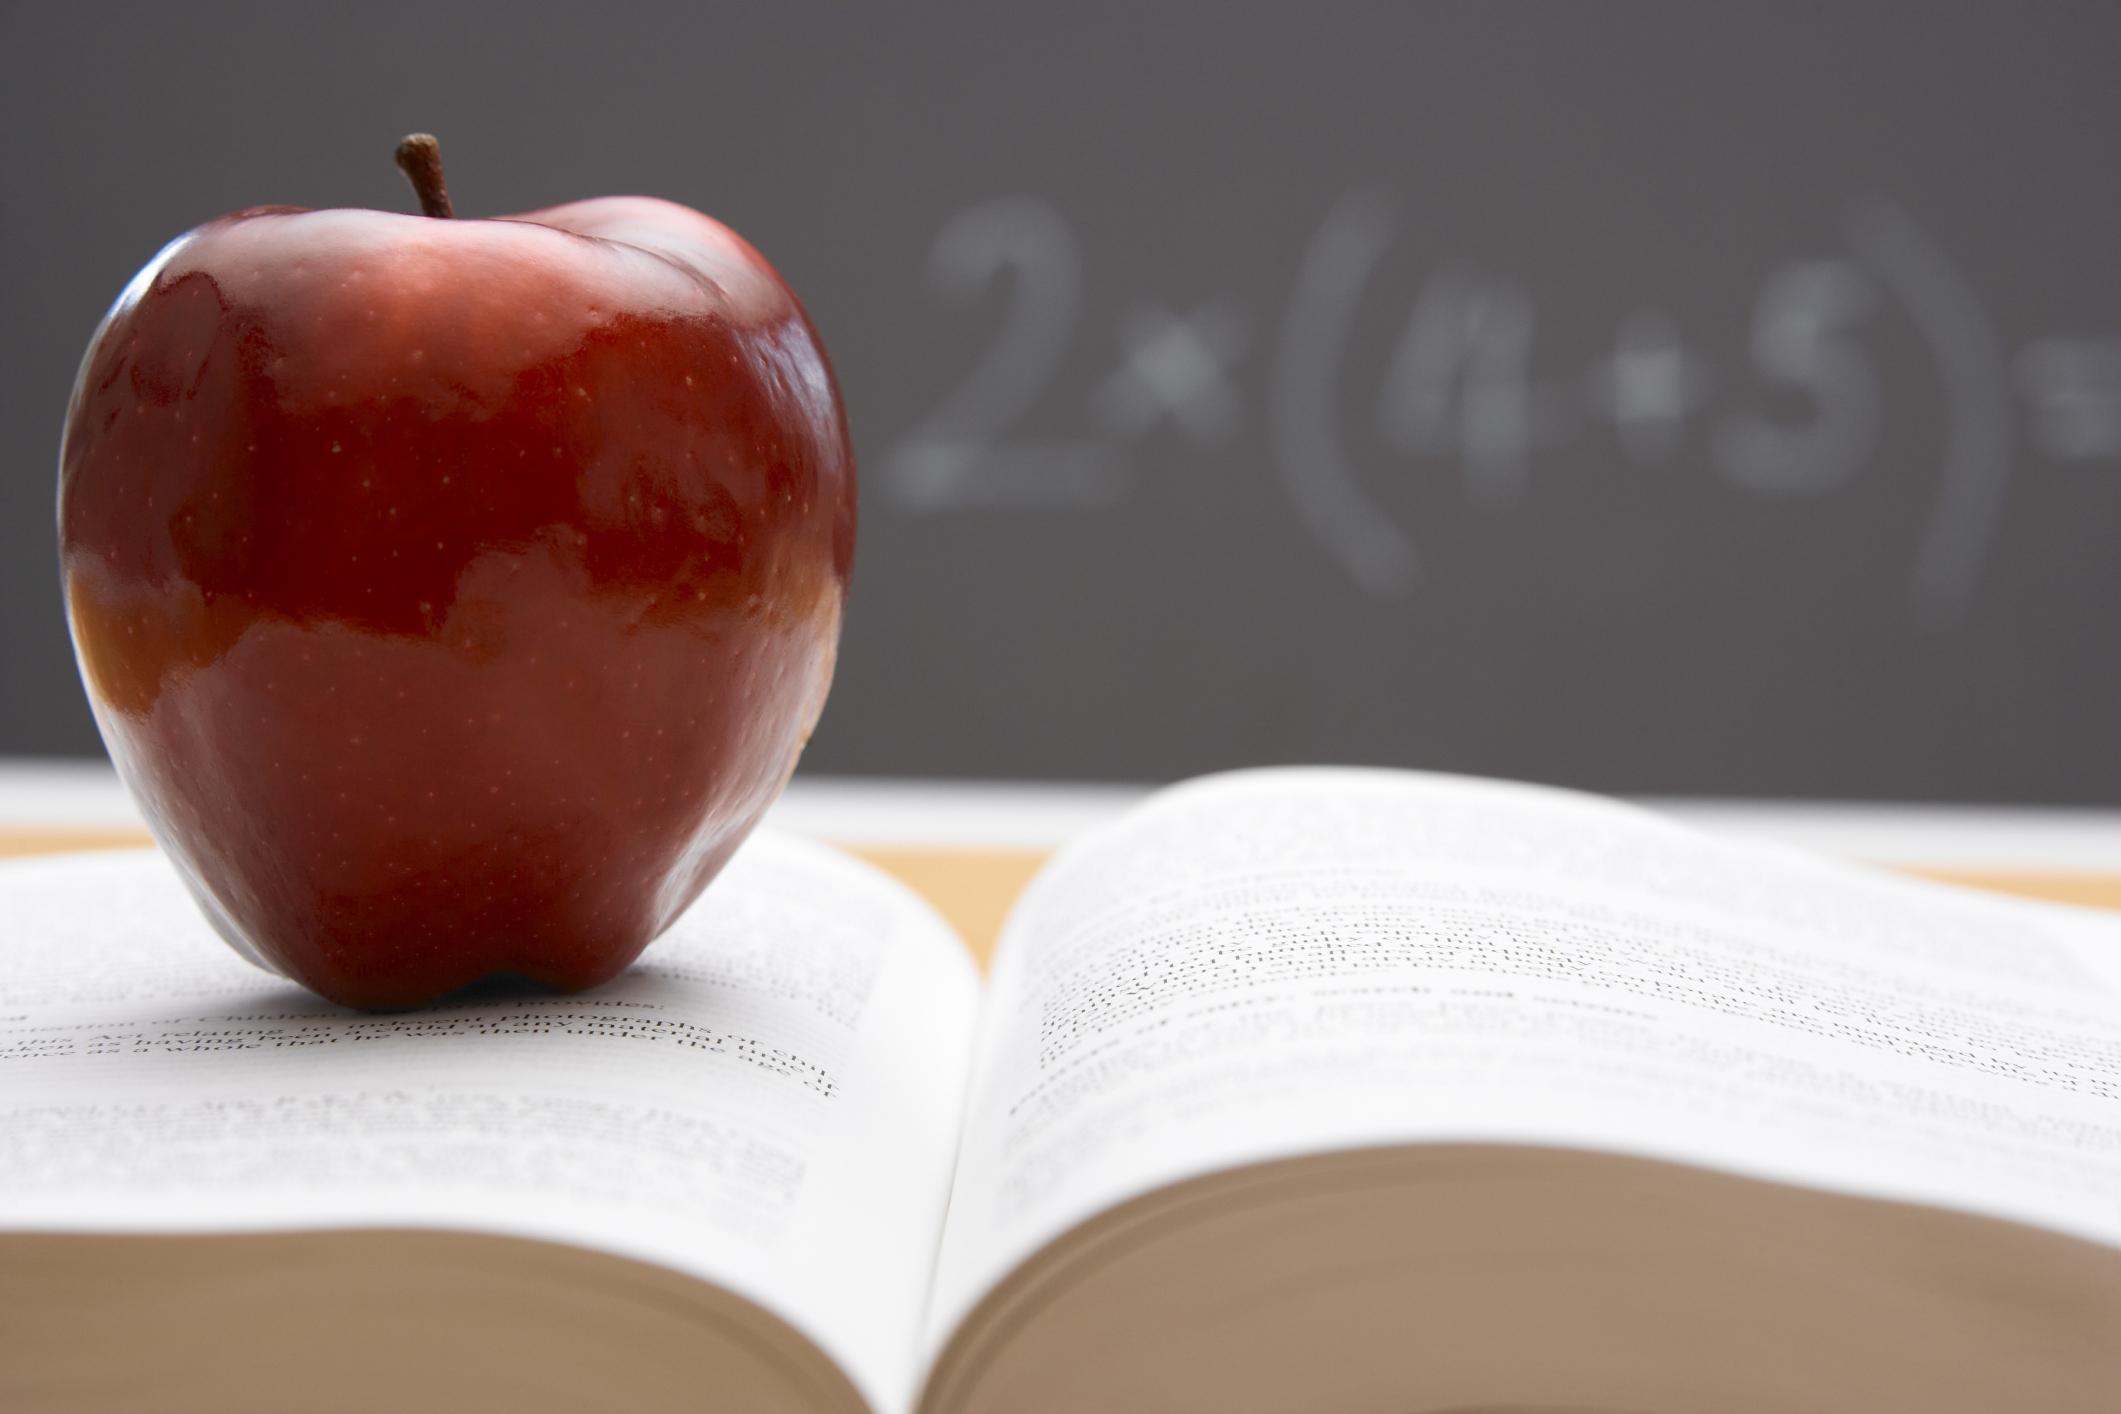 apple, teacher, National Teacher's Day, writing, Common Core, grammar, learning, elementary school